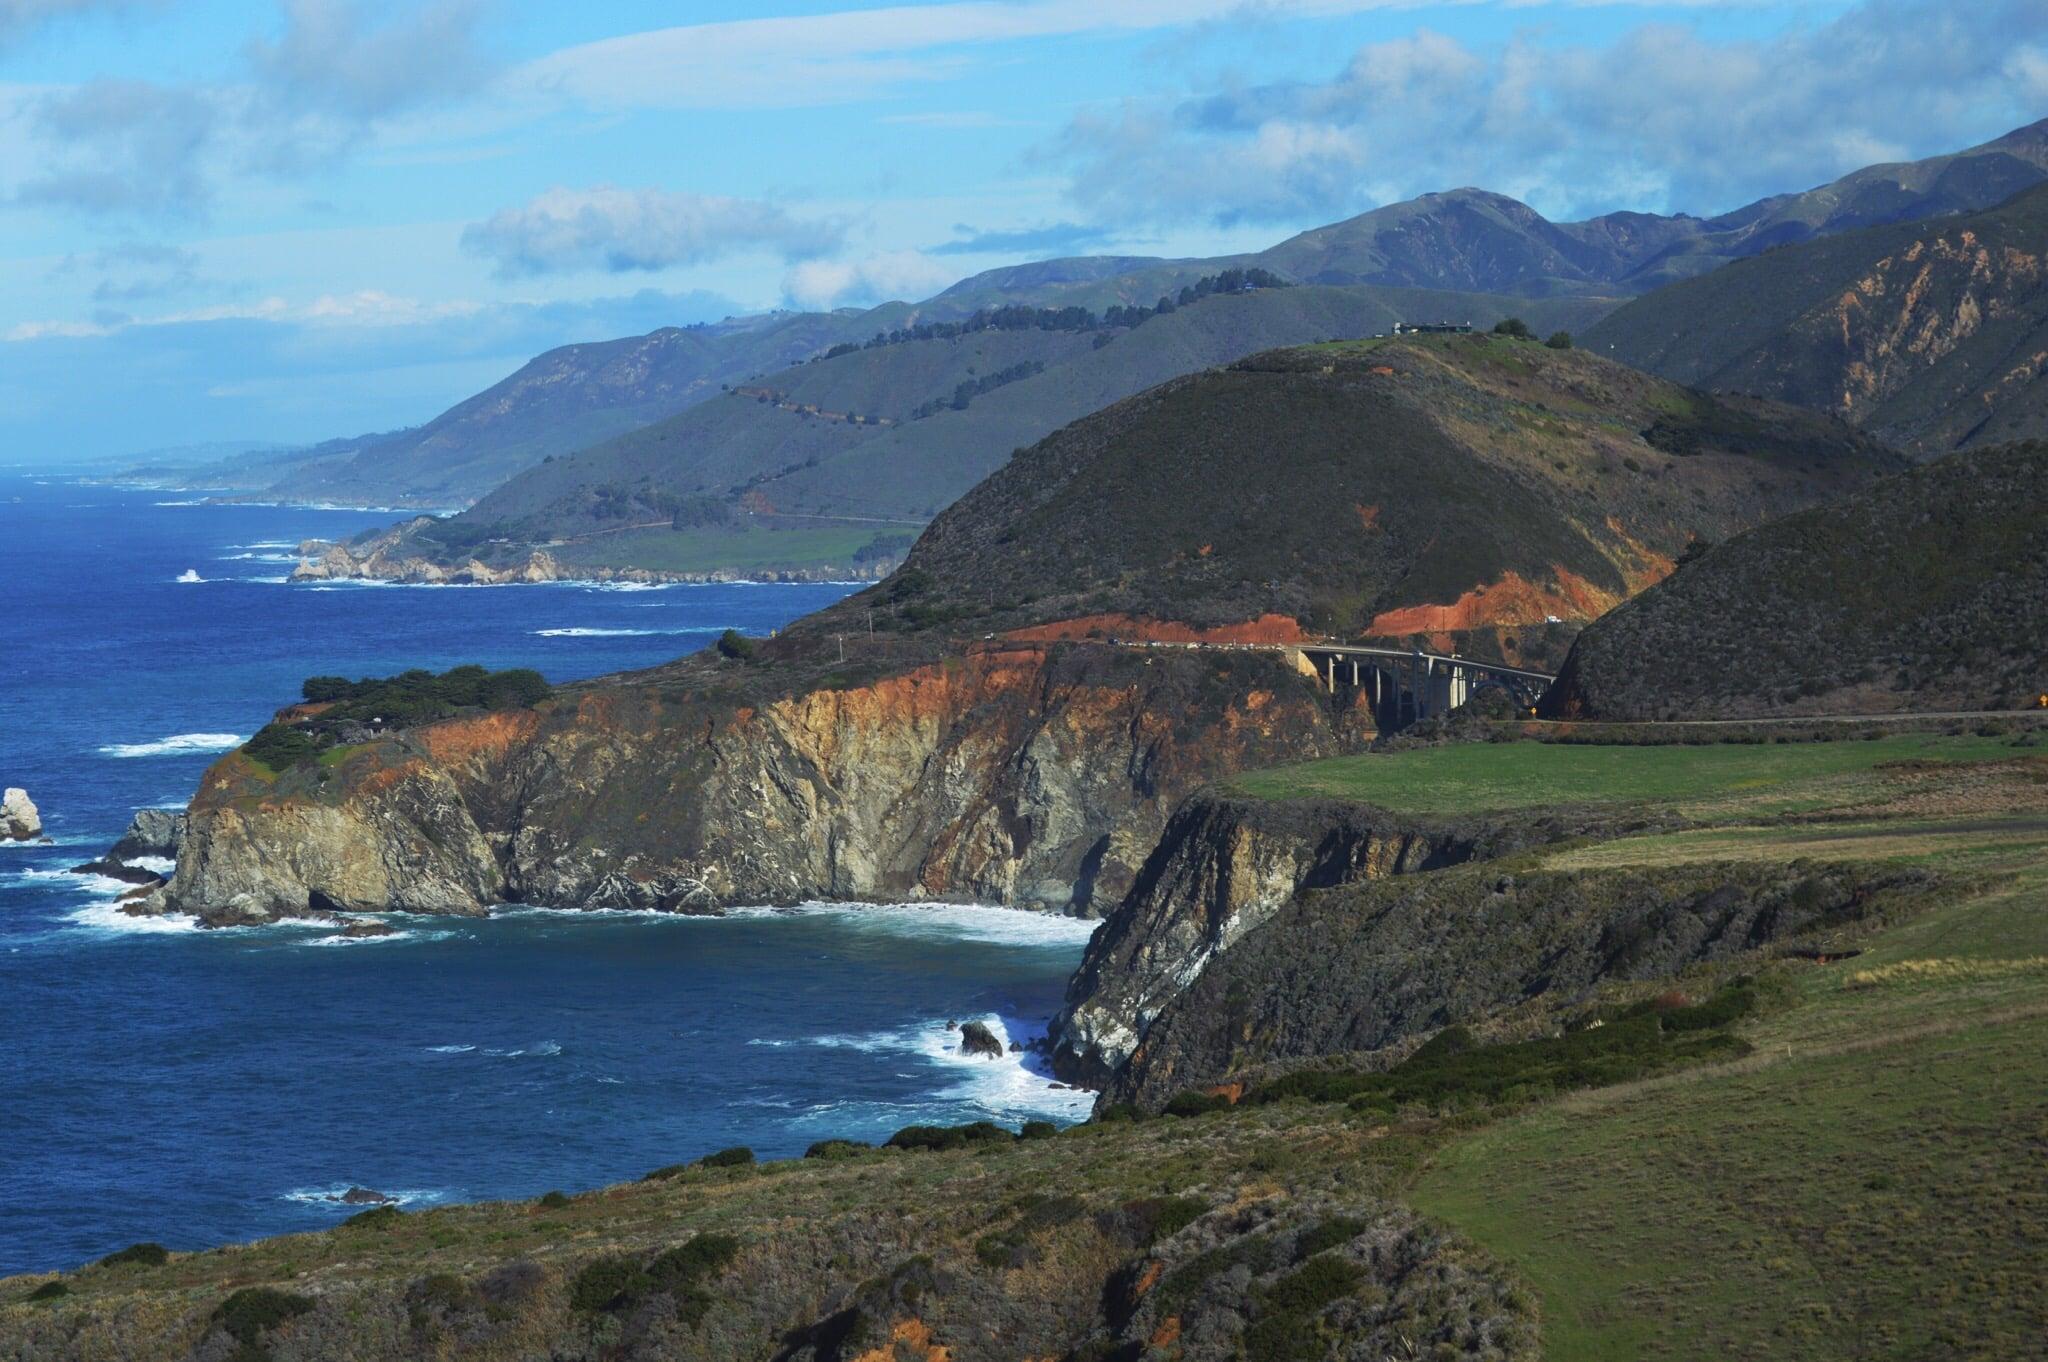 Pacific Coast Highway + Salt Water Vibes